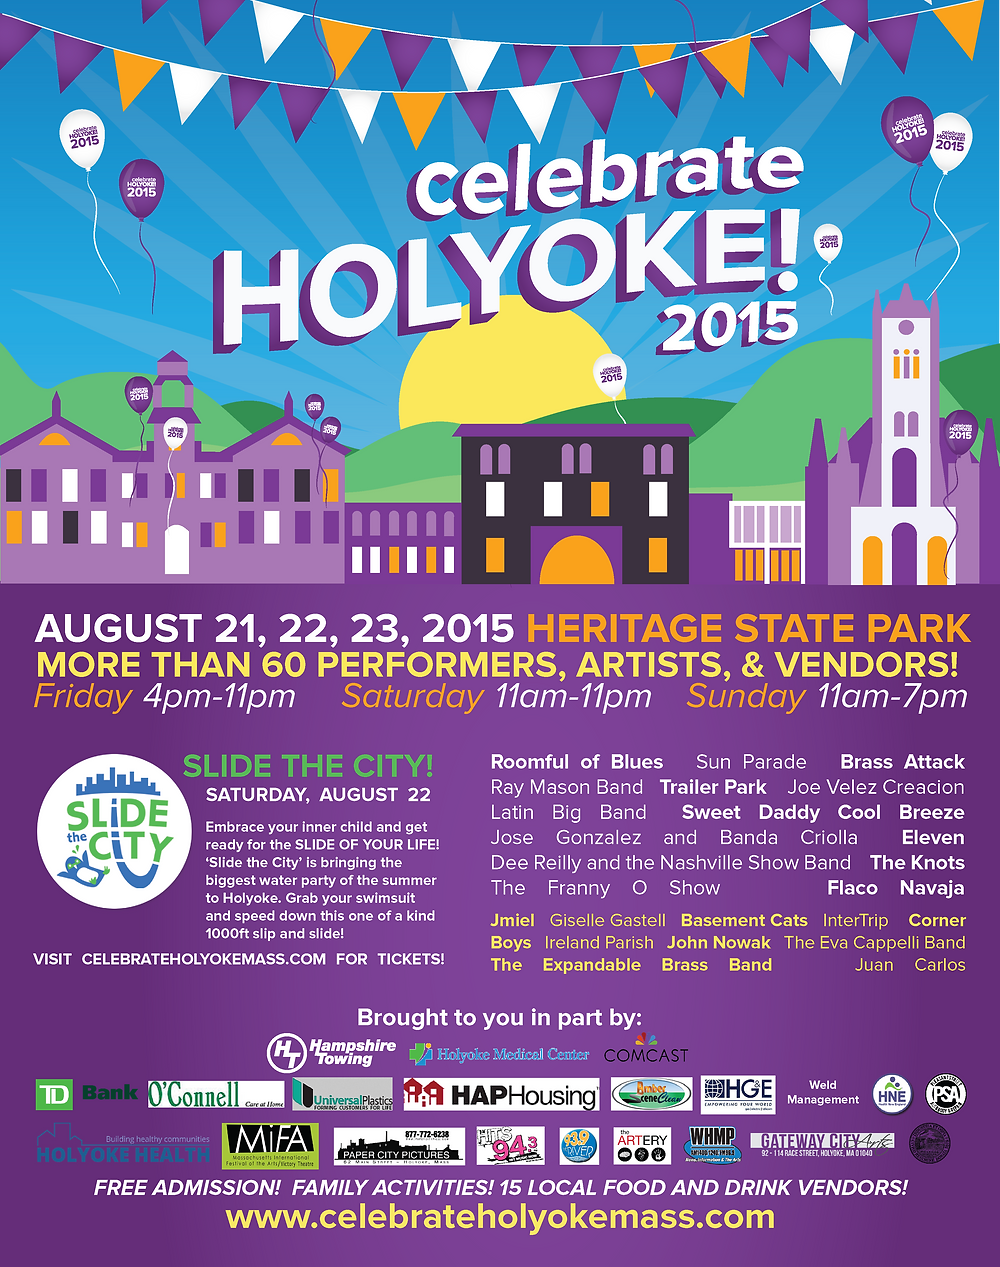 Loryn Design - Celebrate Holyoke Poster 2